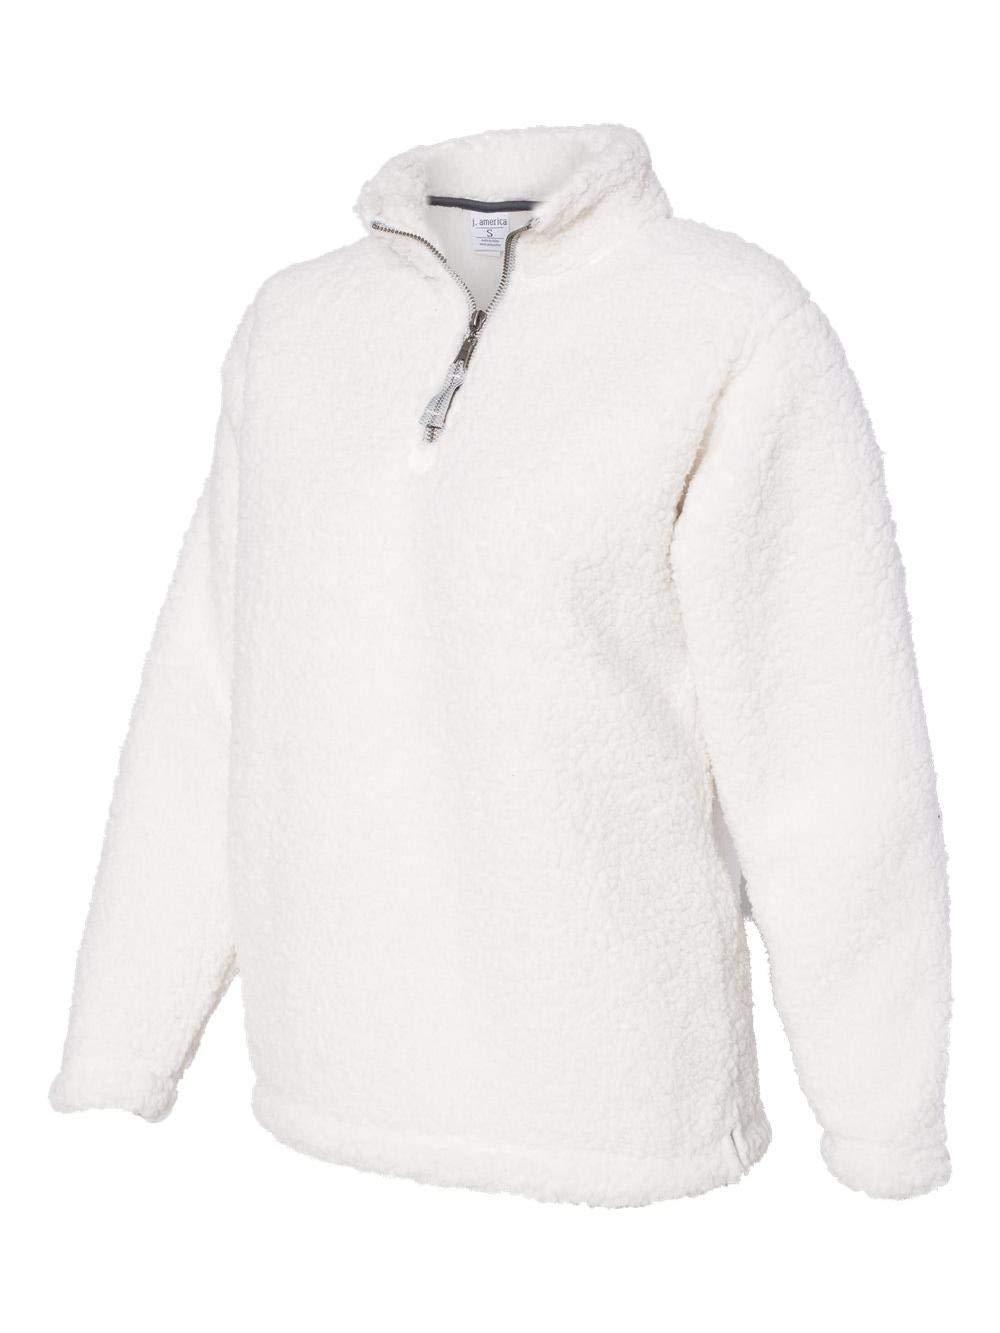 J. America Womens Epic Sherpa 1/4 Zip Sweatshirt (JA8451) -Cream -XL by J. America